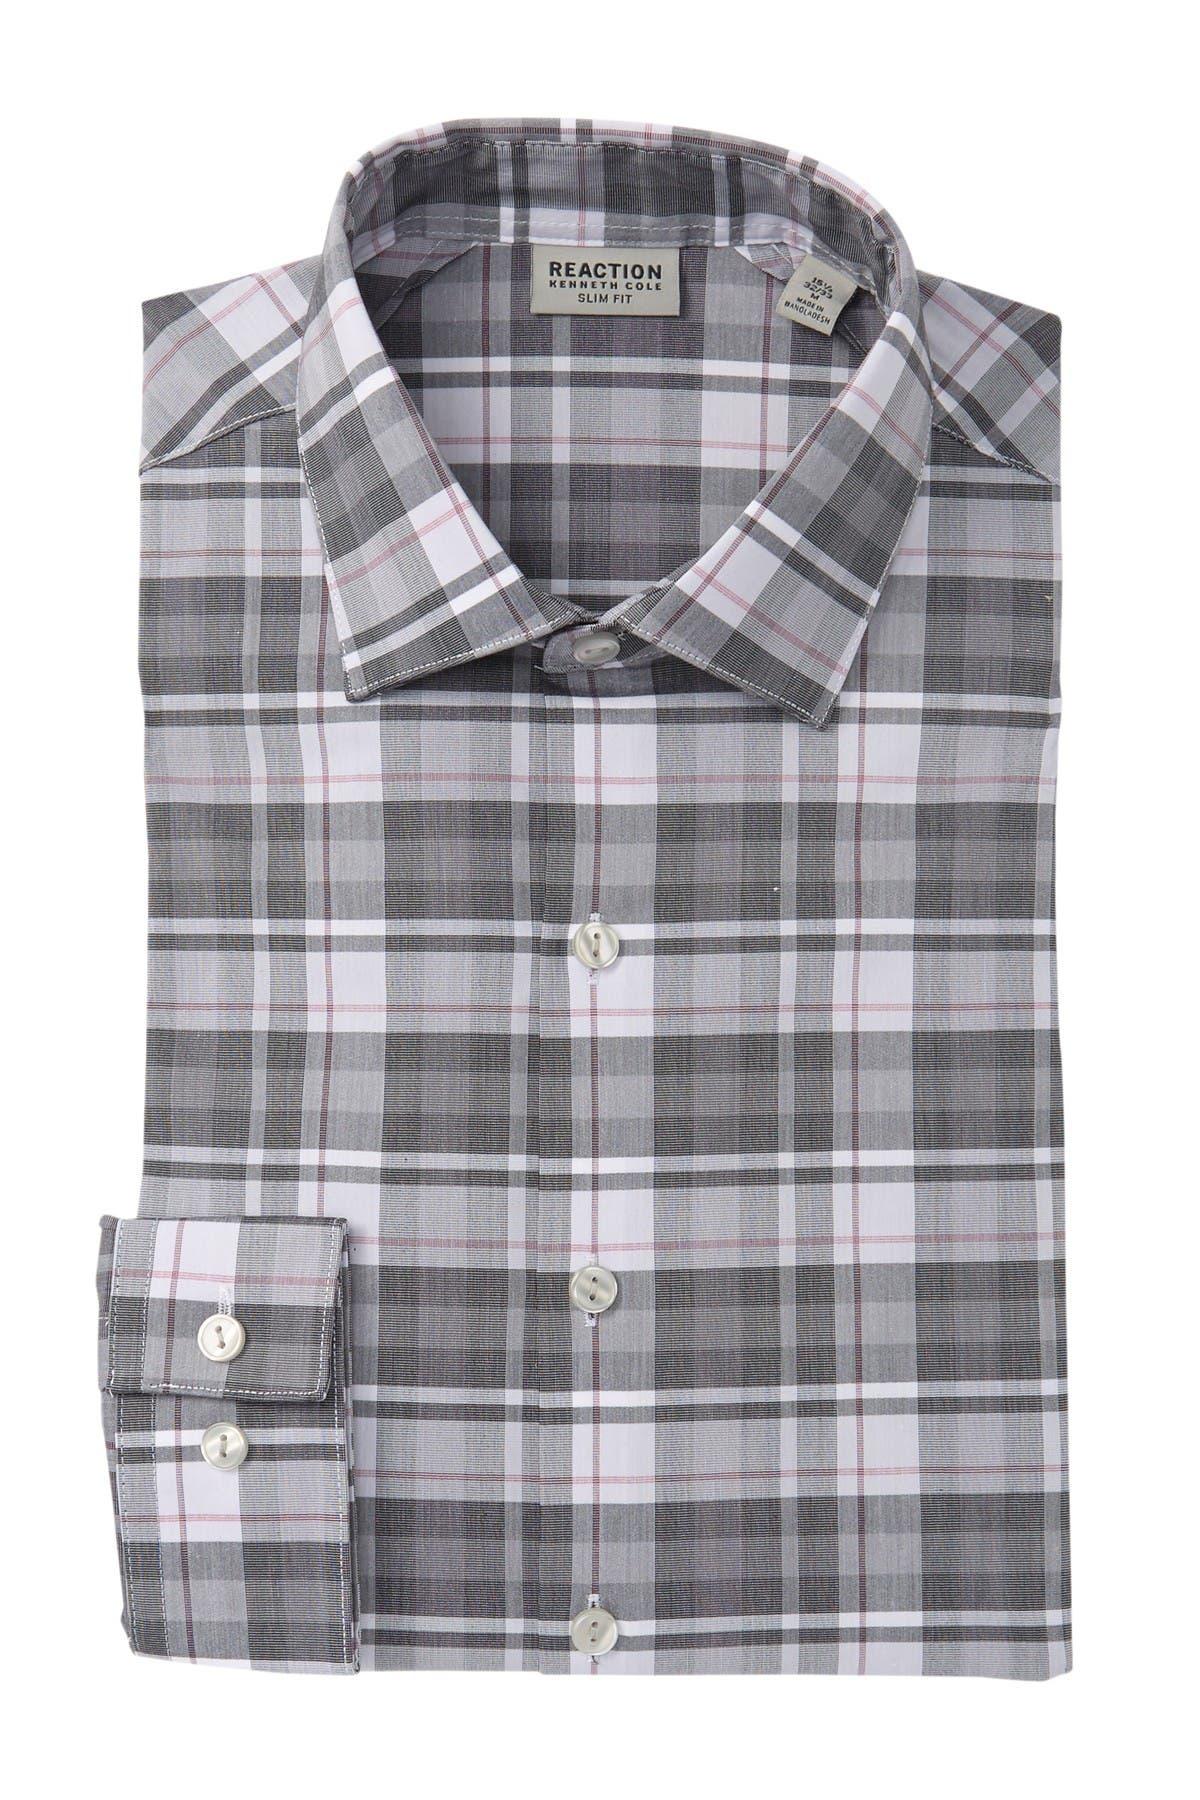 Image of Kenneth Cole Reaction Slim Fit Plaid Dress Shirt